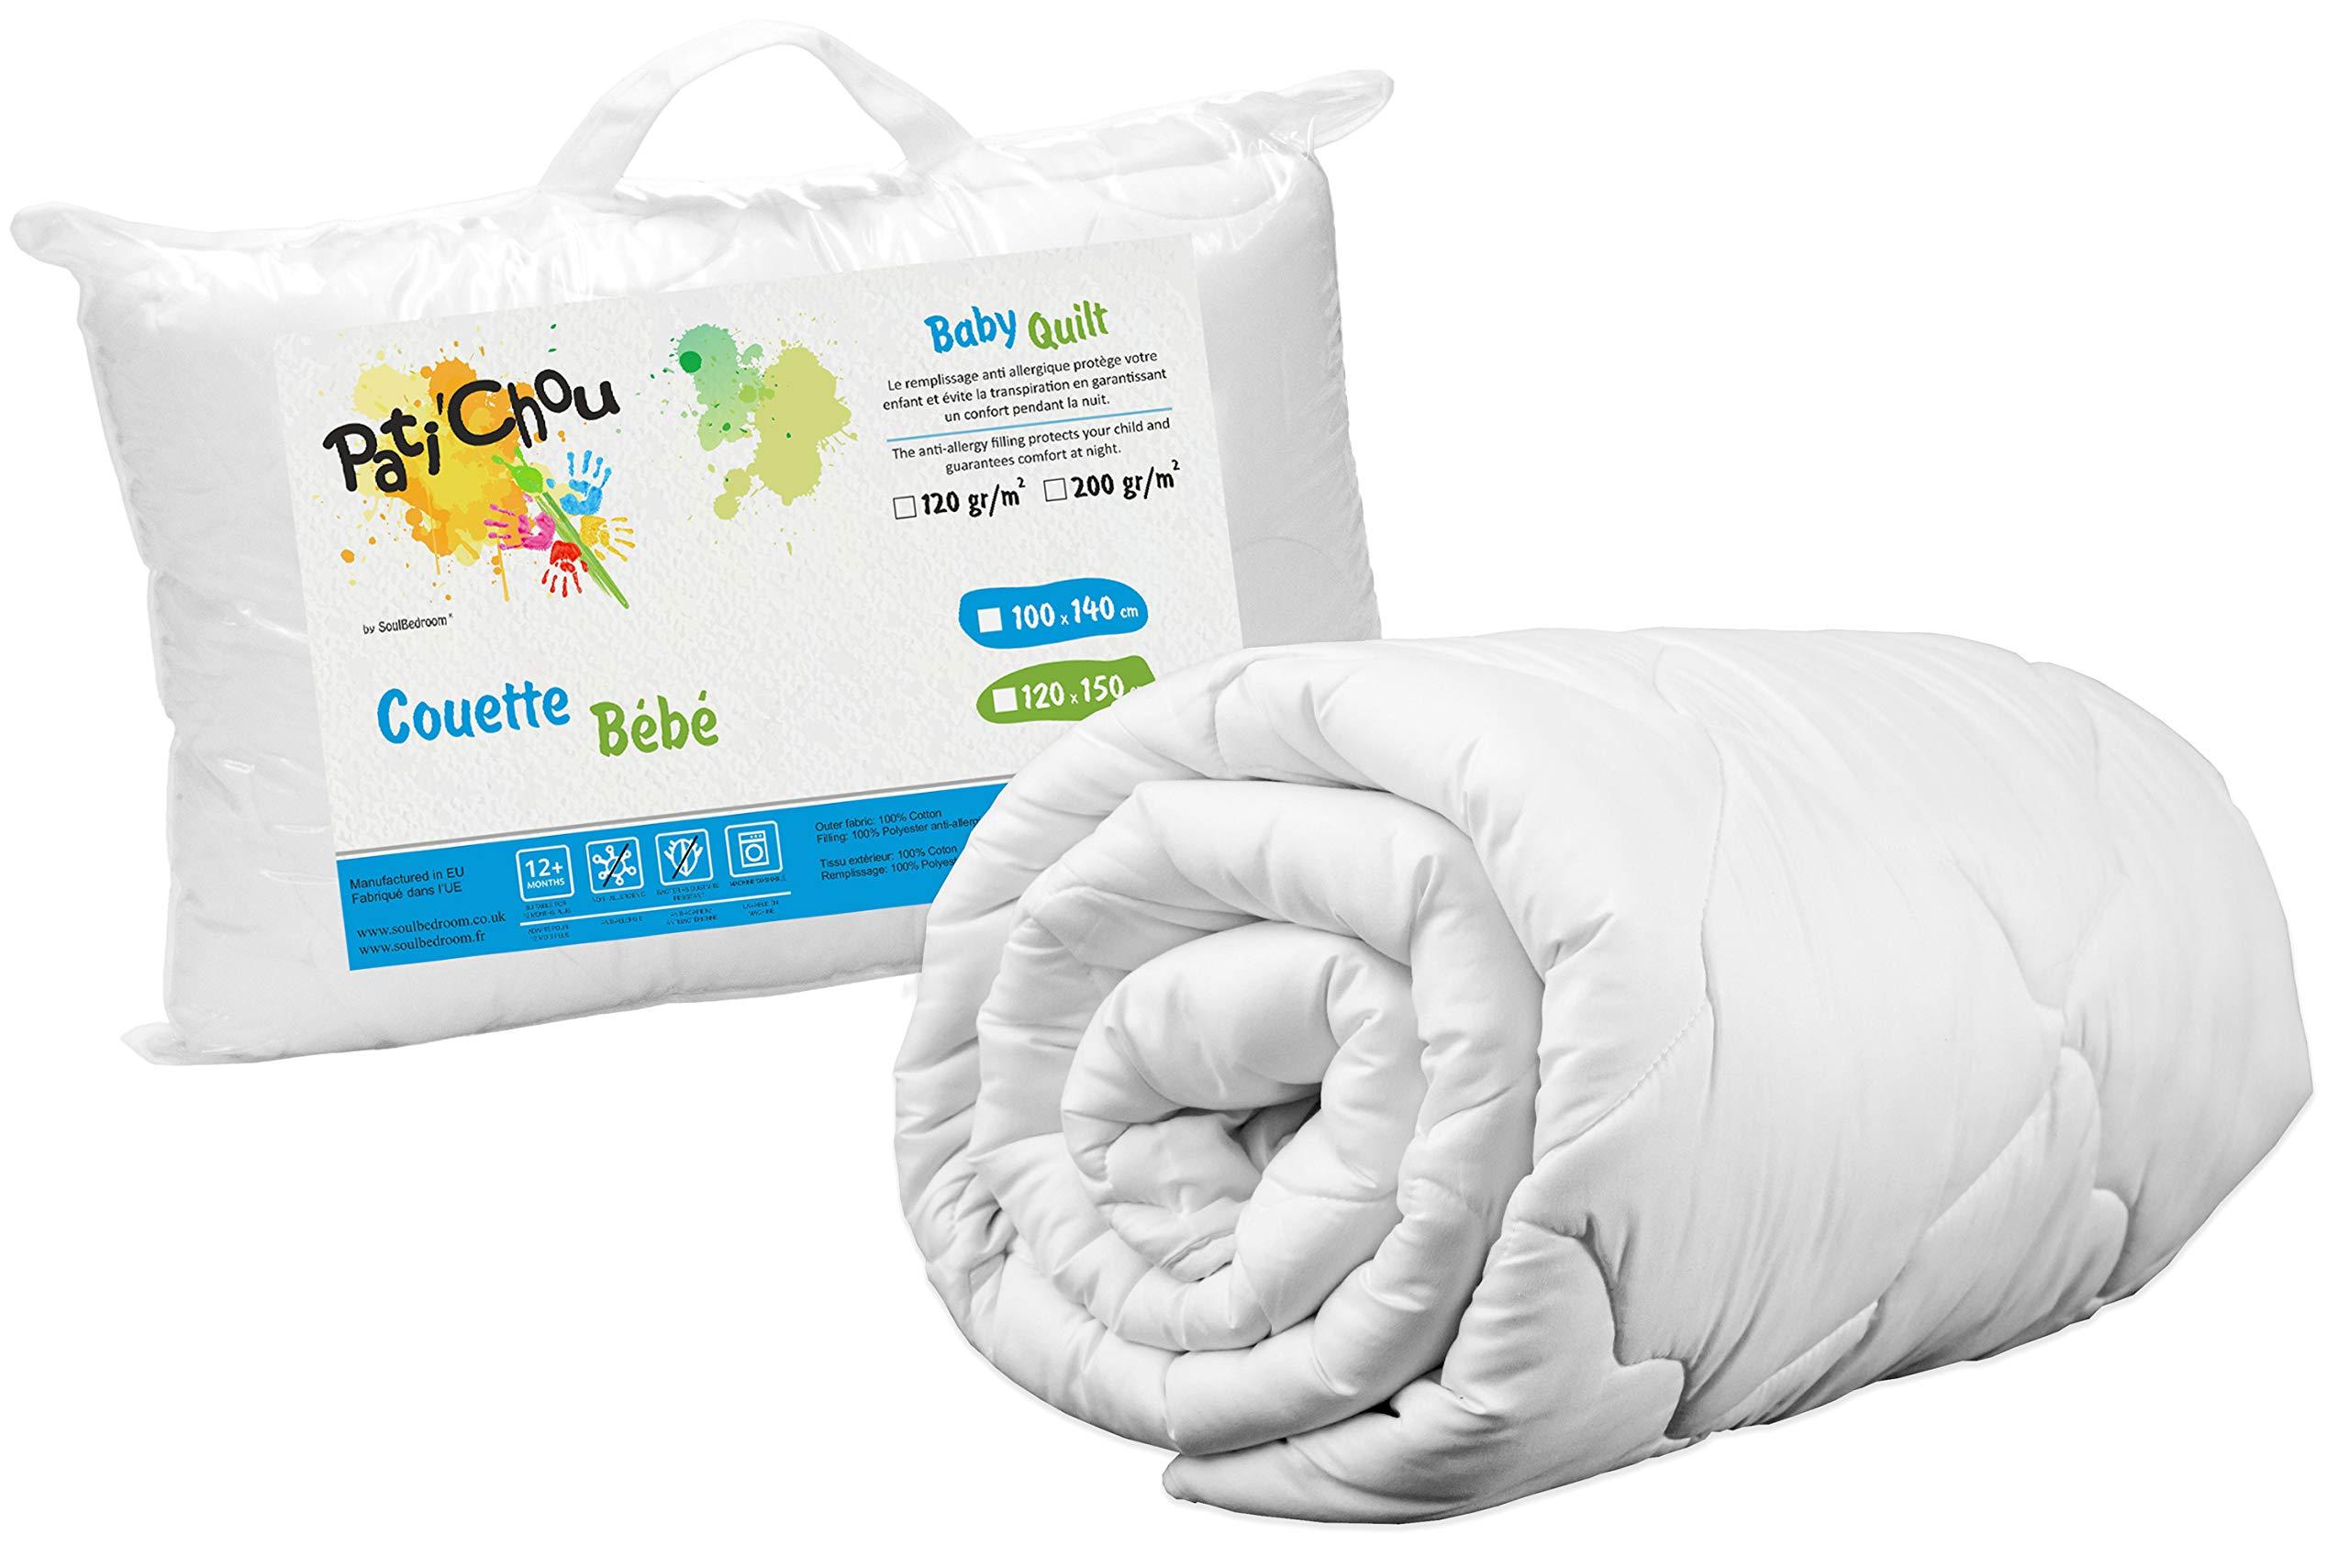 Pati'Chou 39''x 55'' Kids Baby Warm Quilt Duvet (100% Cotton Cover, tog 4) 100x140 cm by Pati'Chou